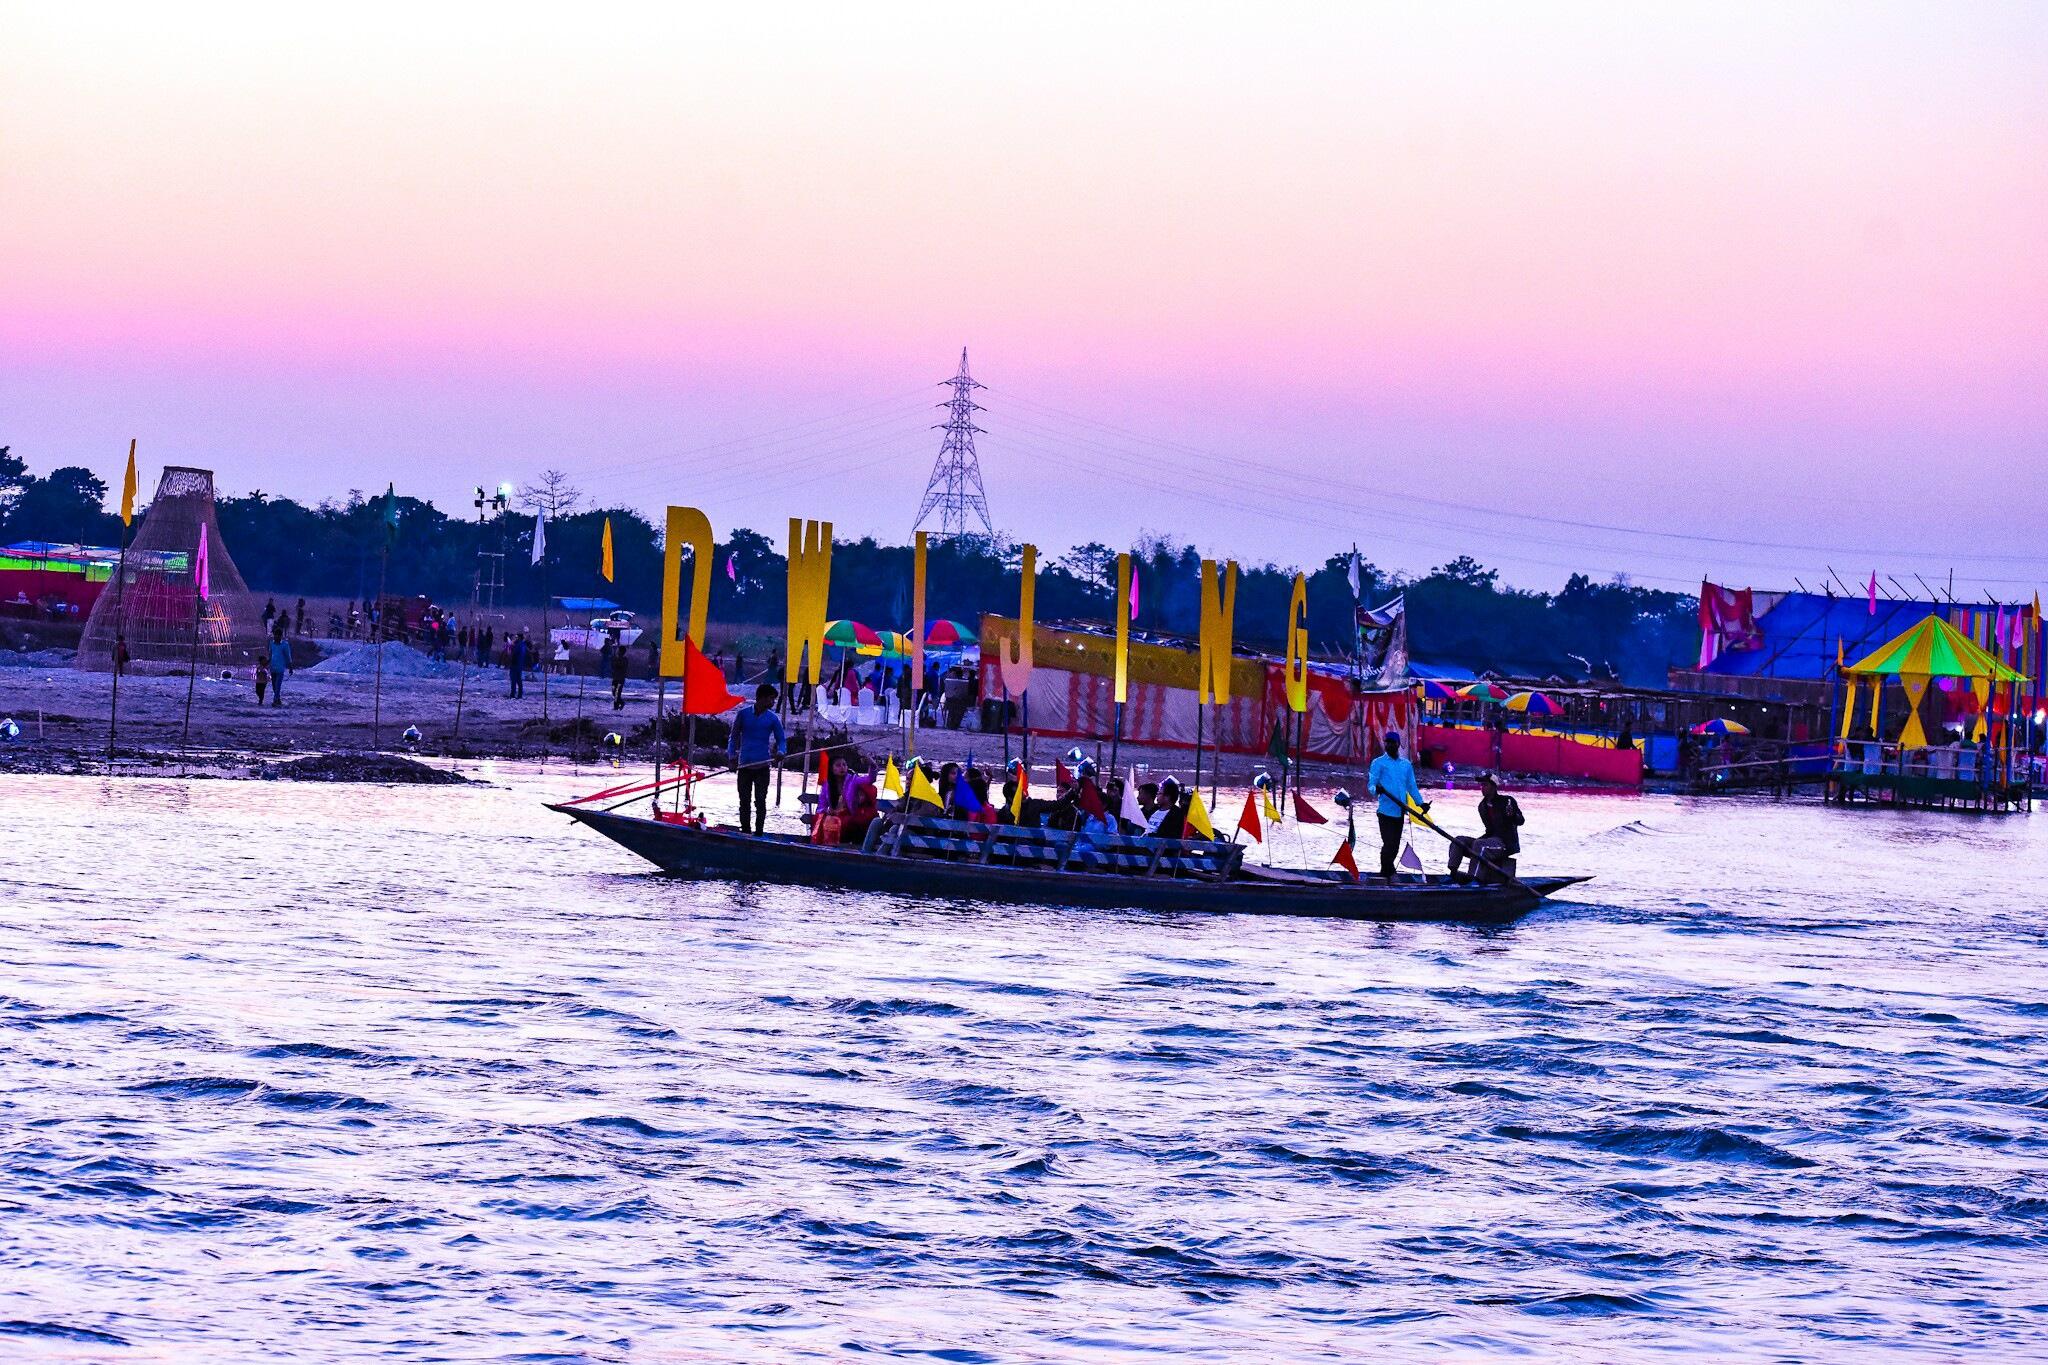 boat by Sudeep Mandal